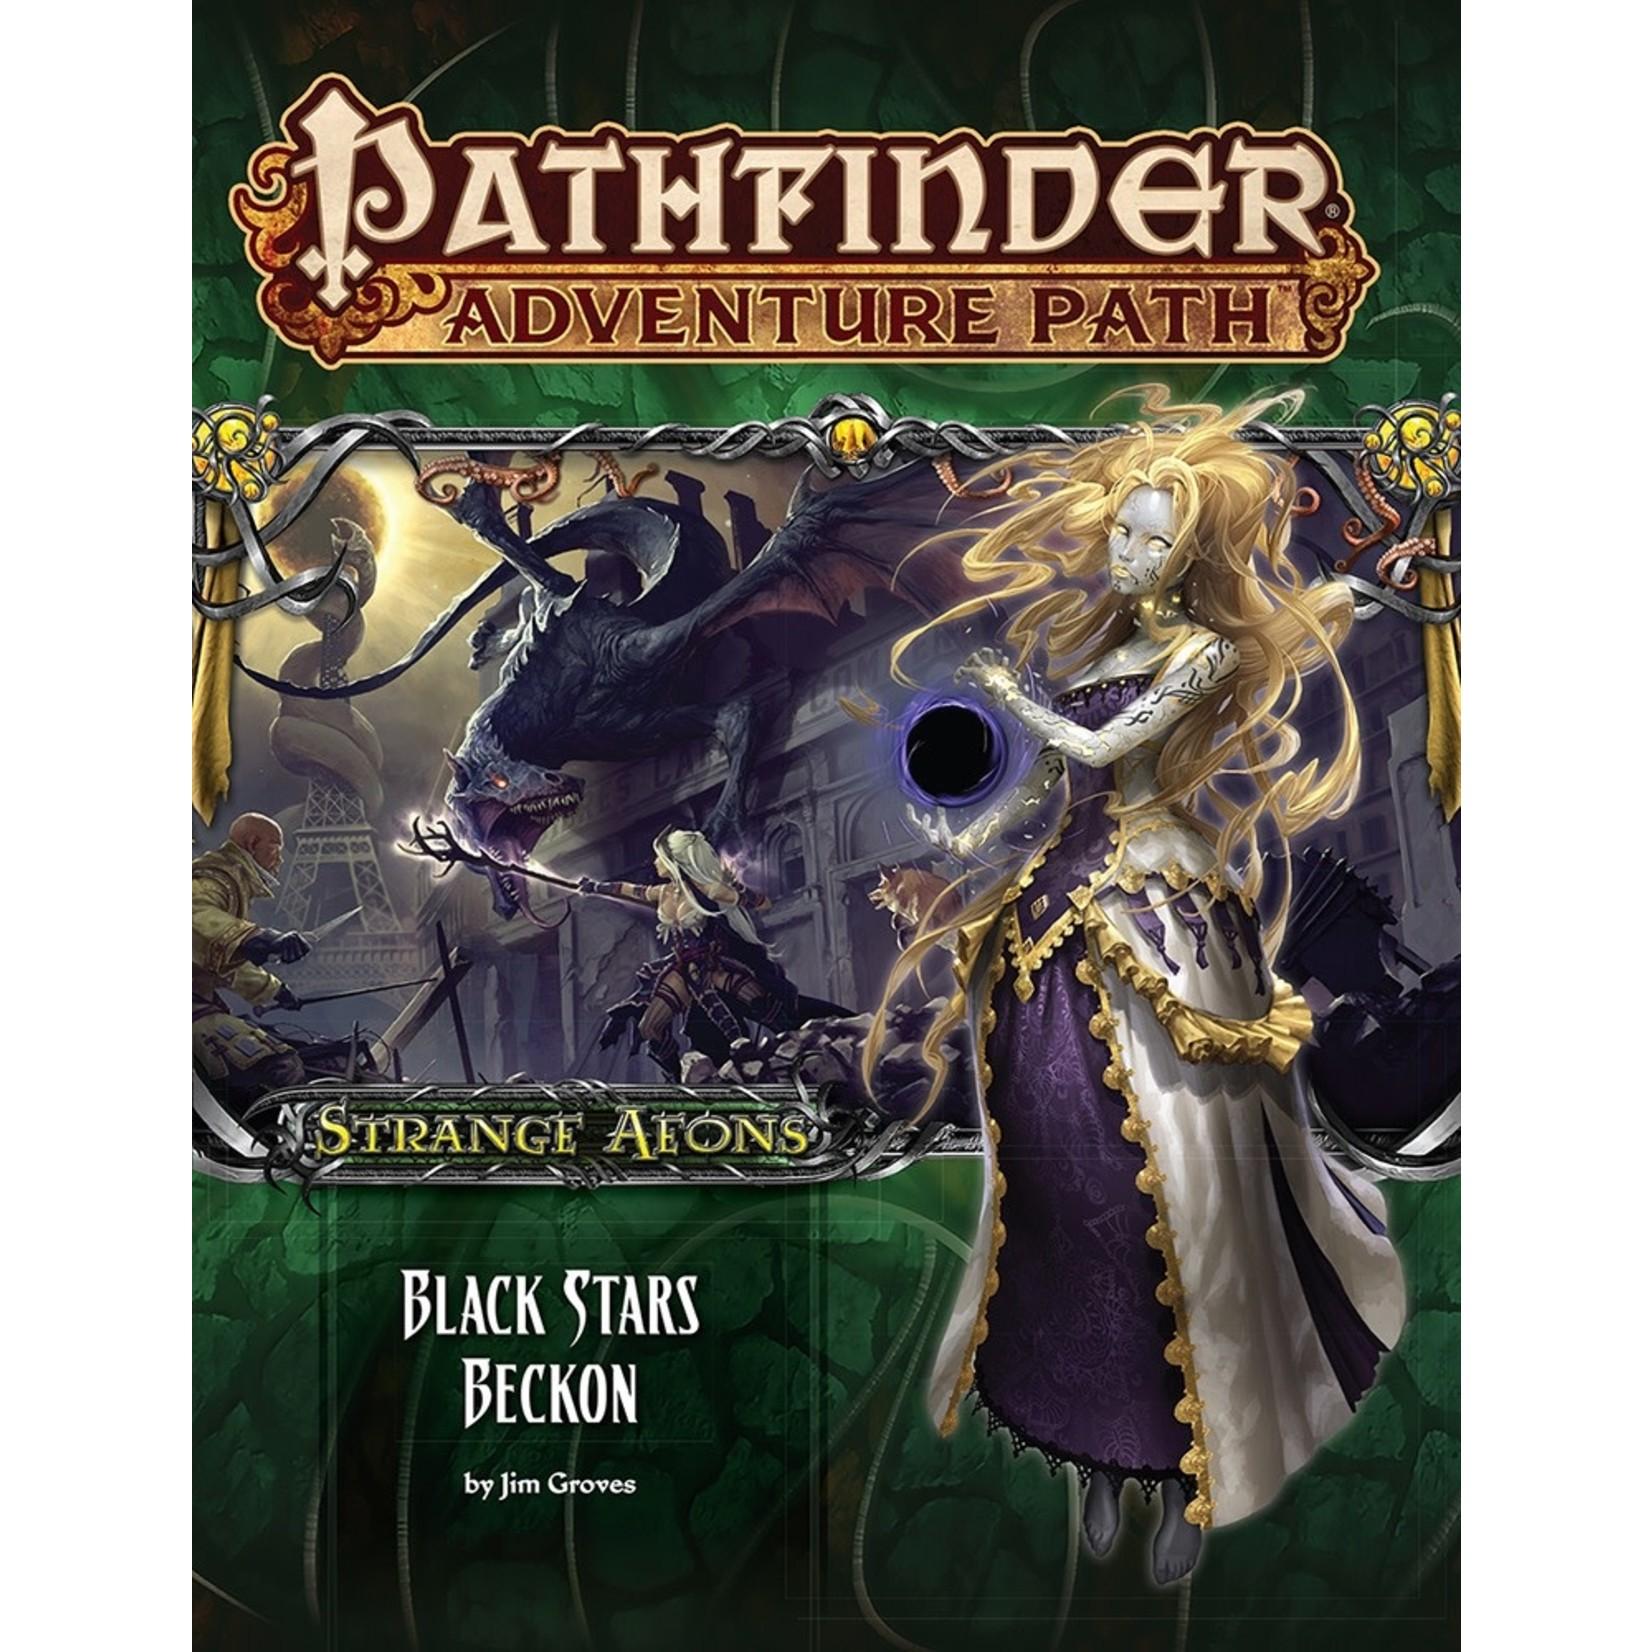 Pathfinder Adventure Path #114: Strange Aeons - Black Stars Beckon